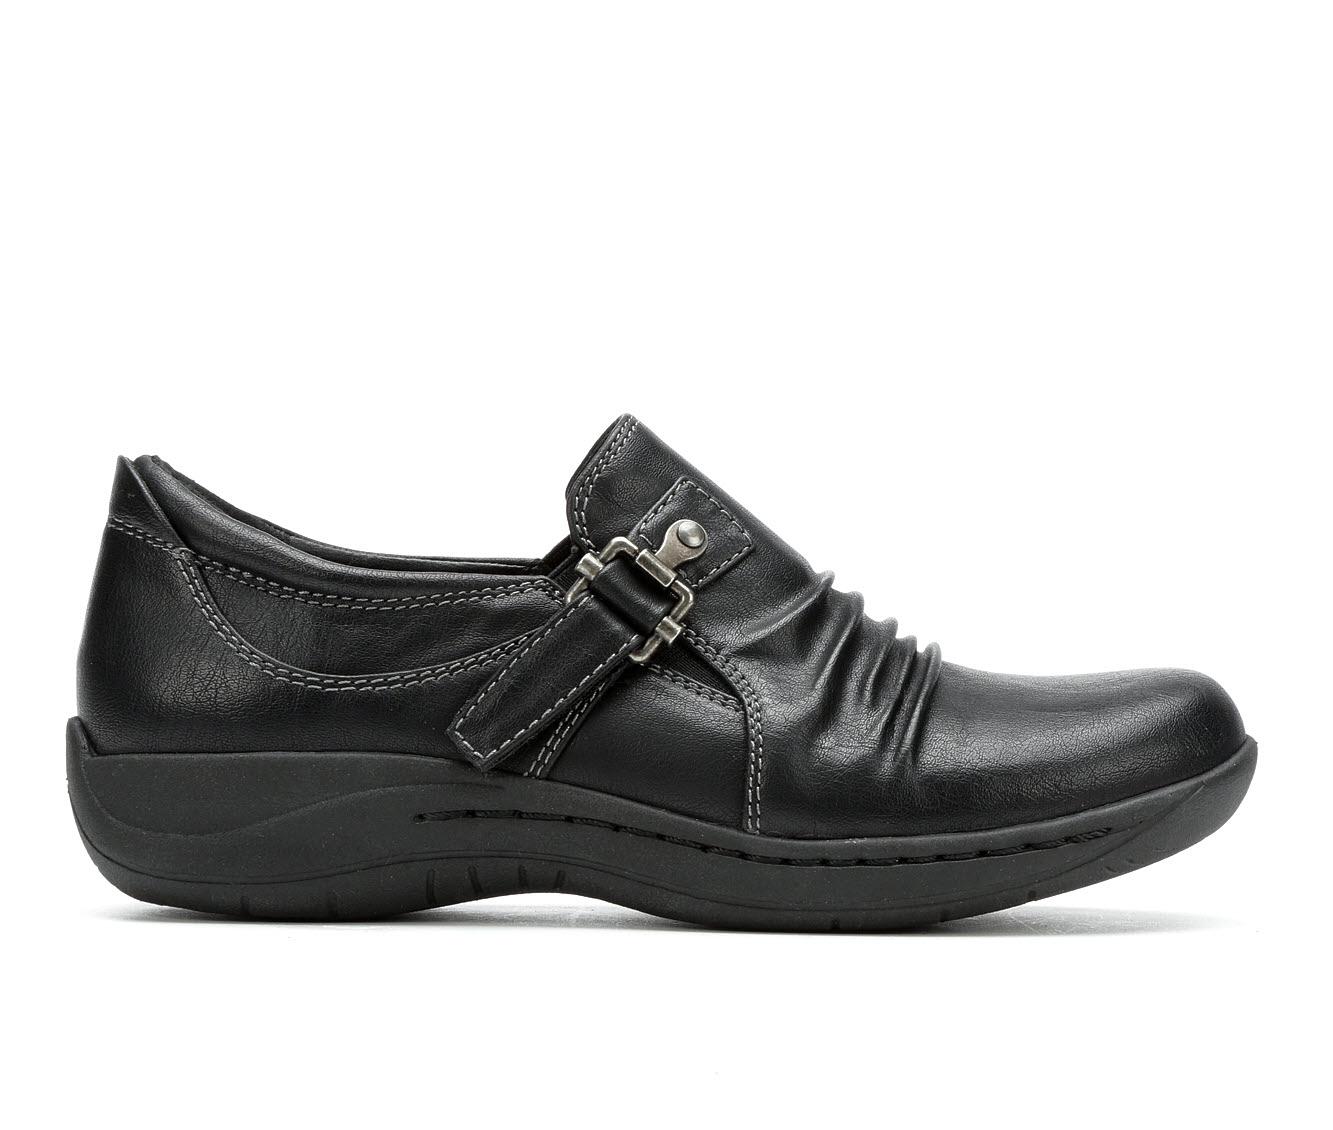 Baretraps Jemma Women's Shoe (Black Faux Leather)